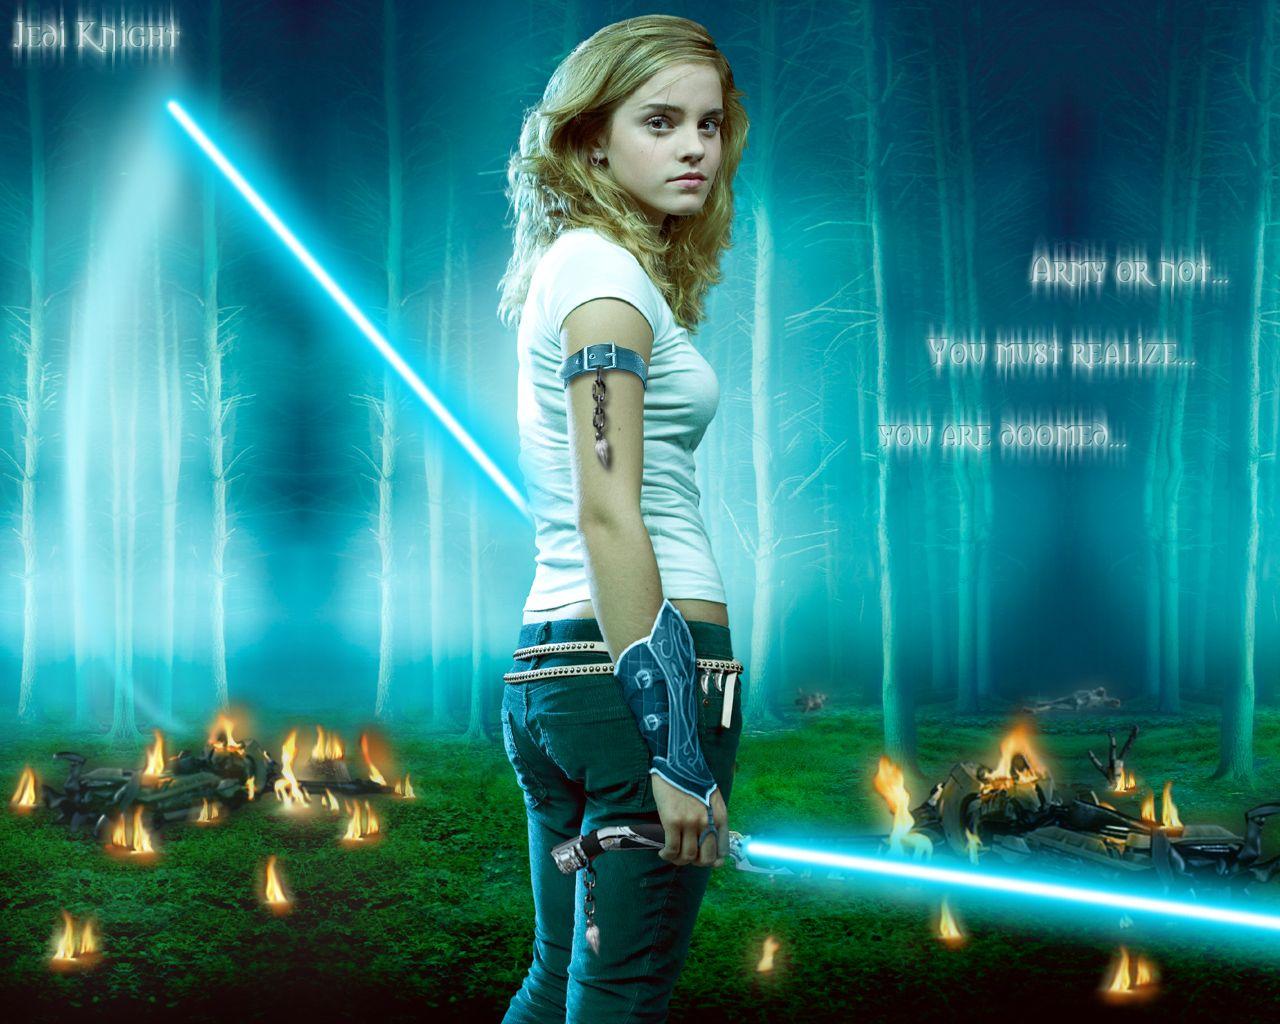 Emma Watson Jedi Knight By Rhanubis Deviantart Com On